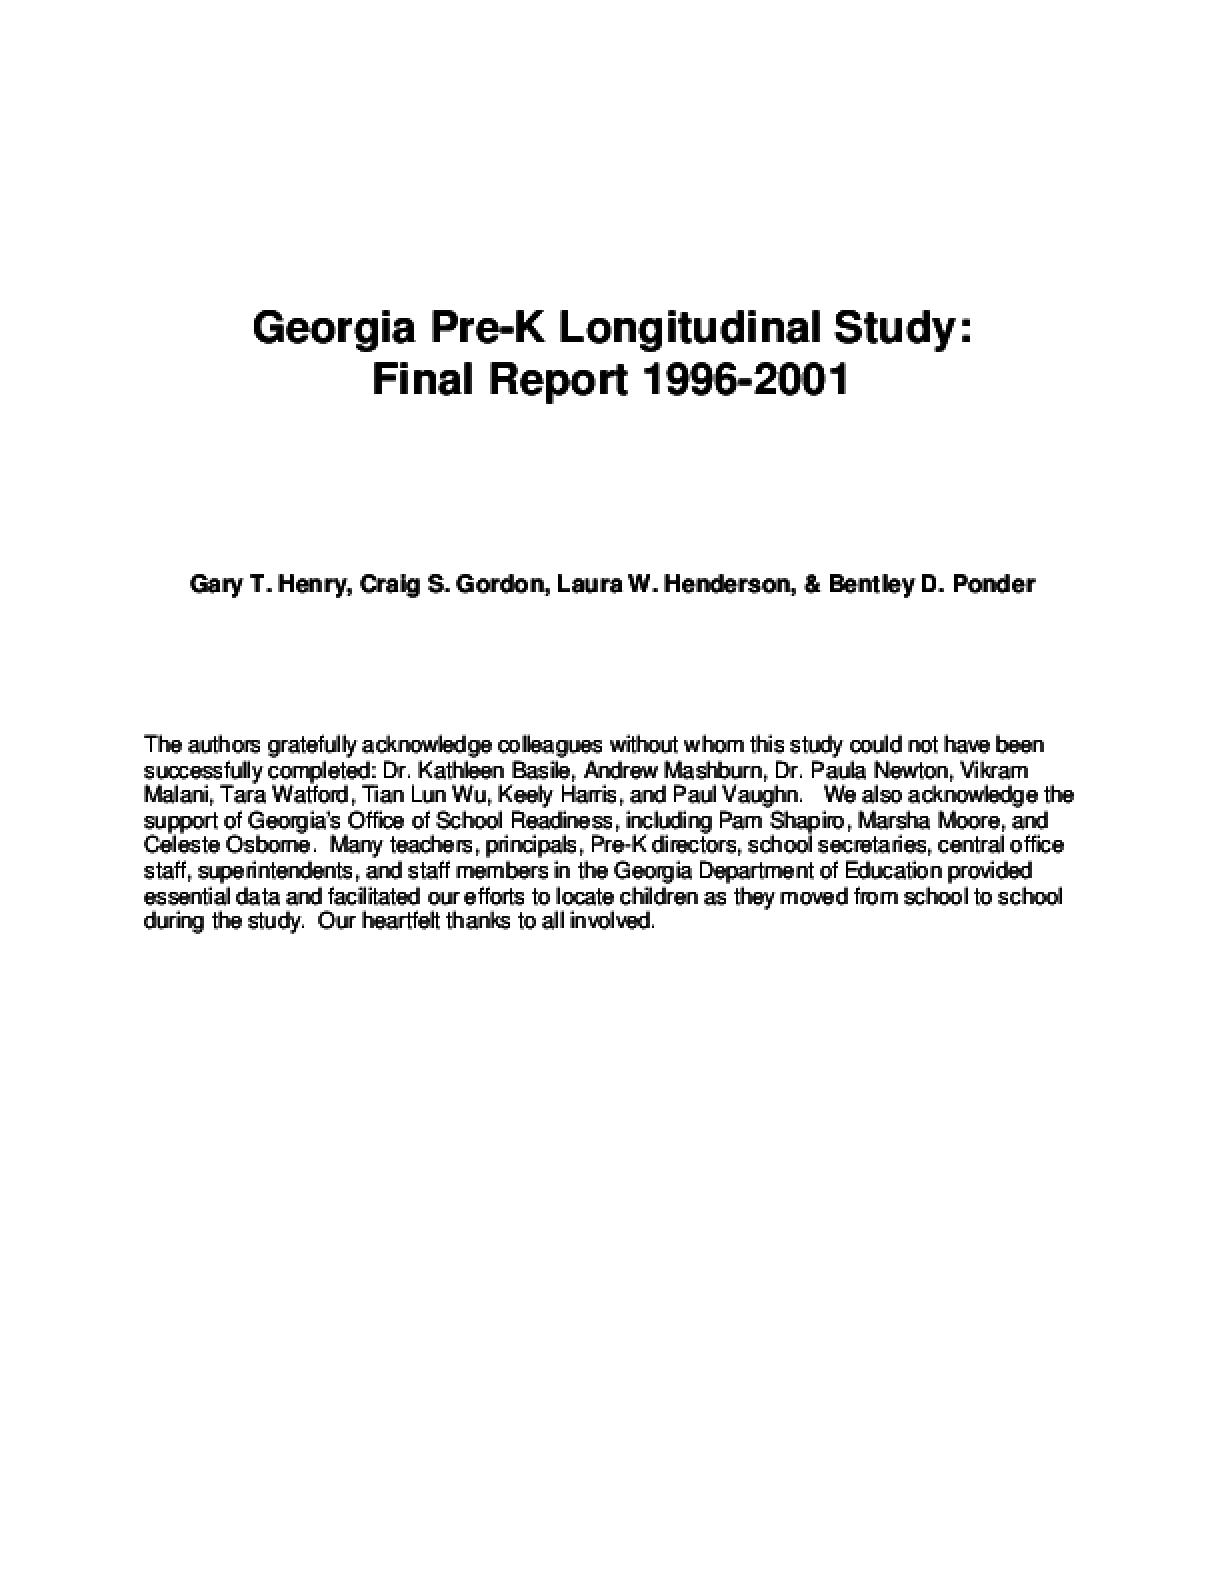 Georgia Pre-K Longitudinal Study: Final Report 1996-2001